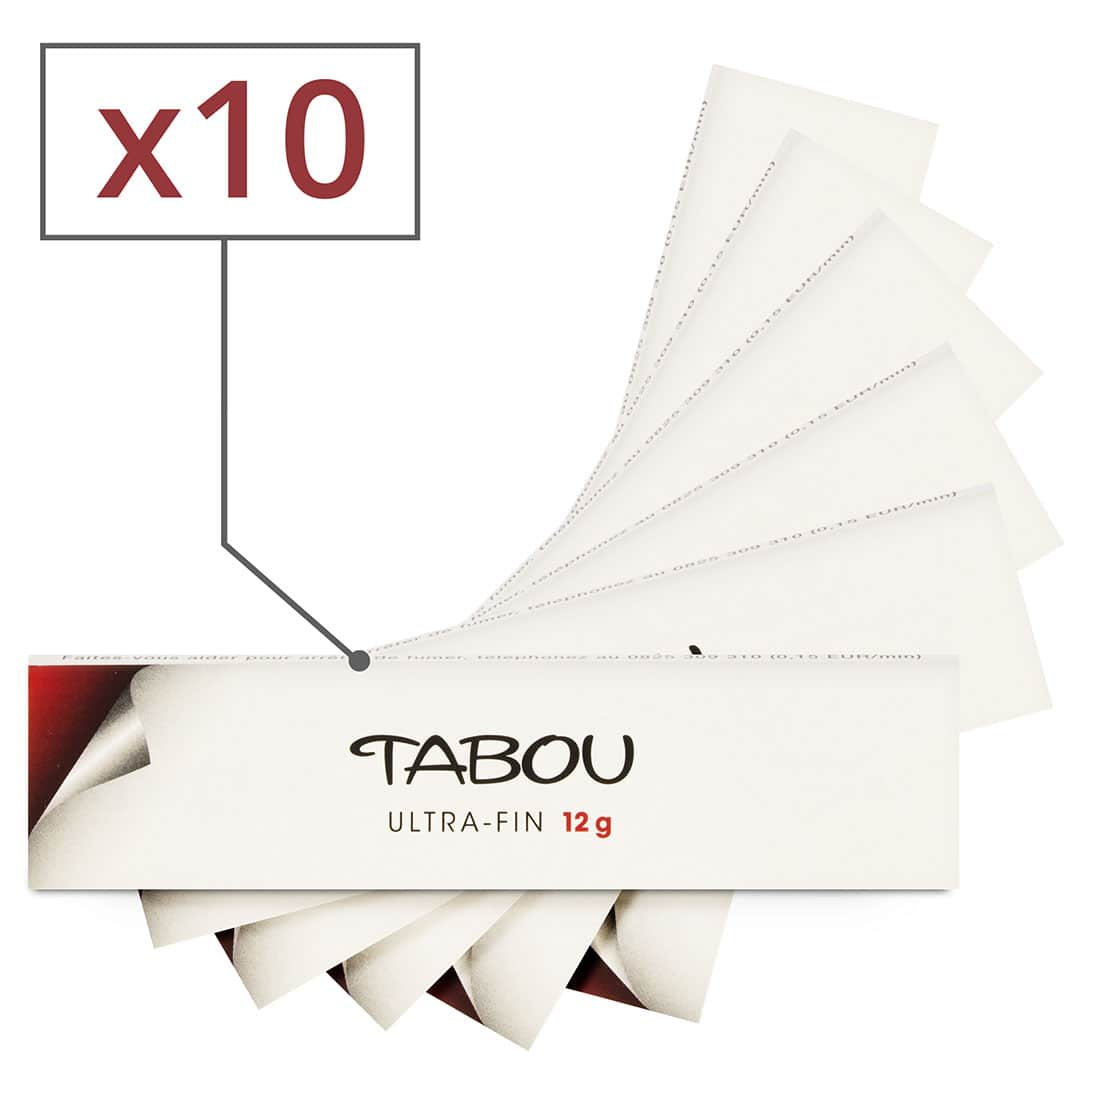 Photo de Feuille a rouler Tabou Slim Ultra Fin x 10